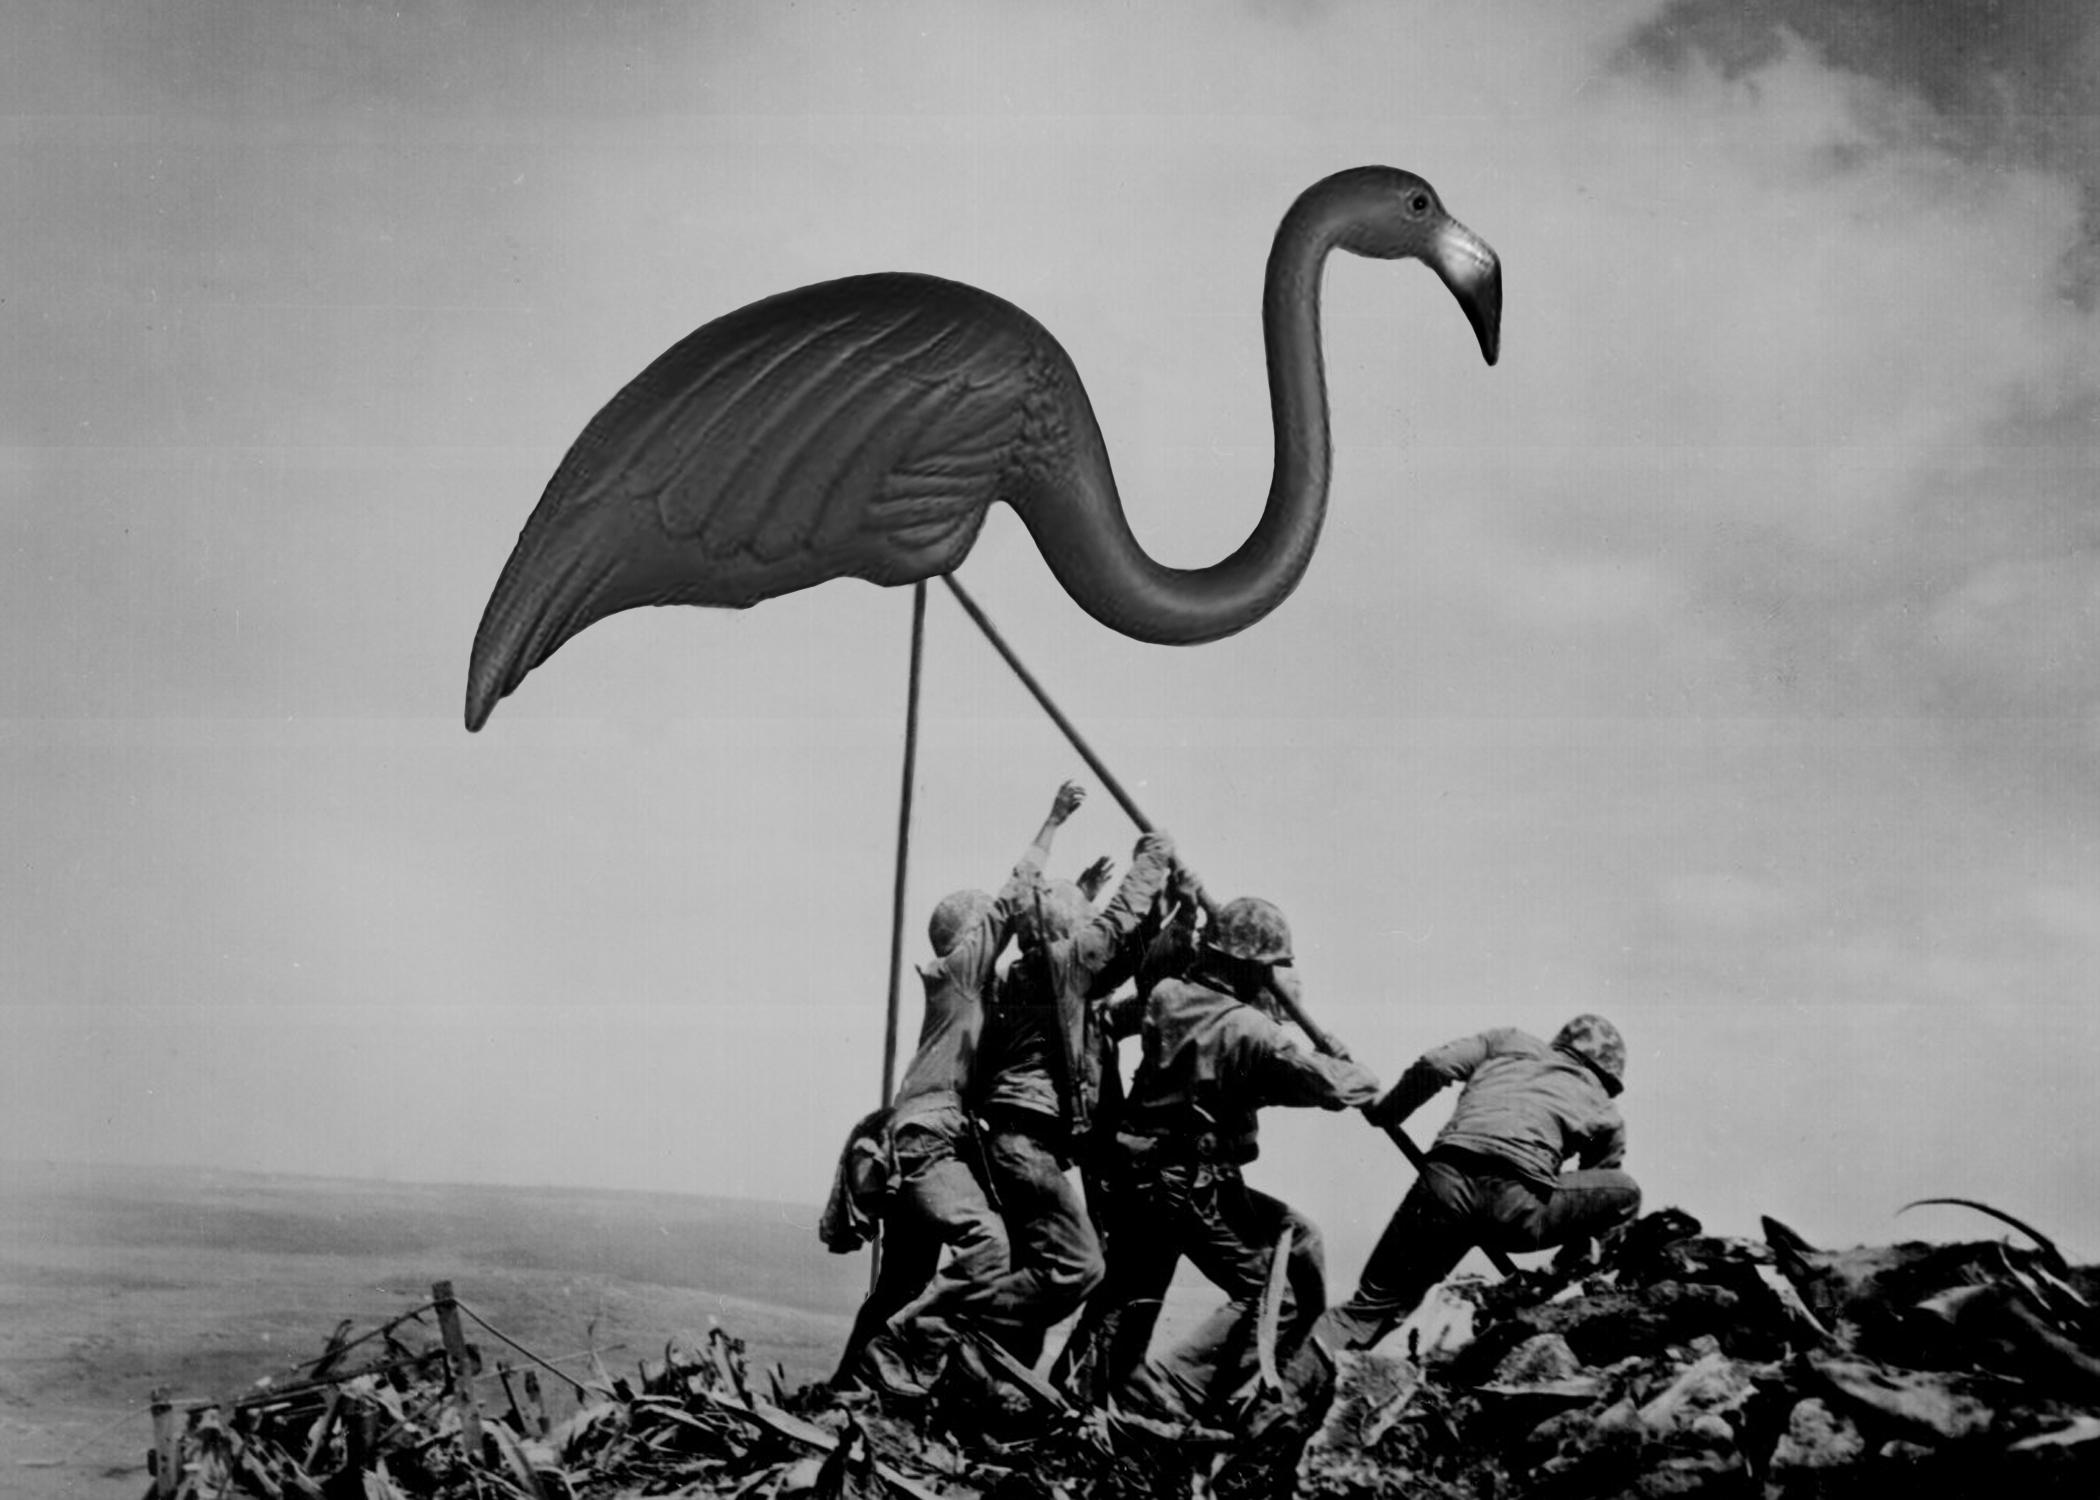 McDade_flamingo1.jpg